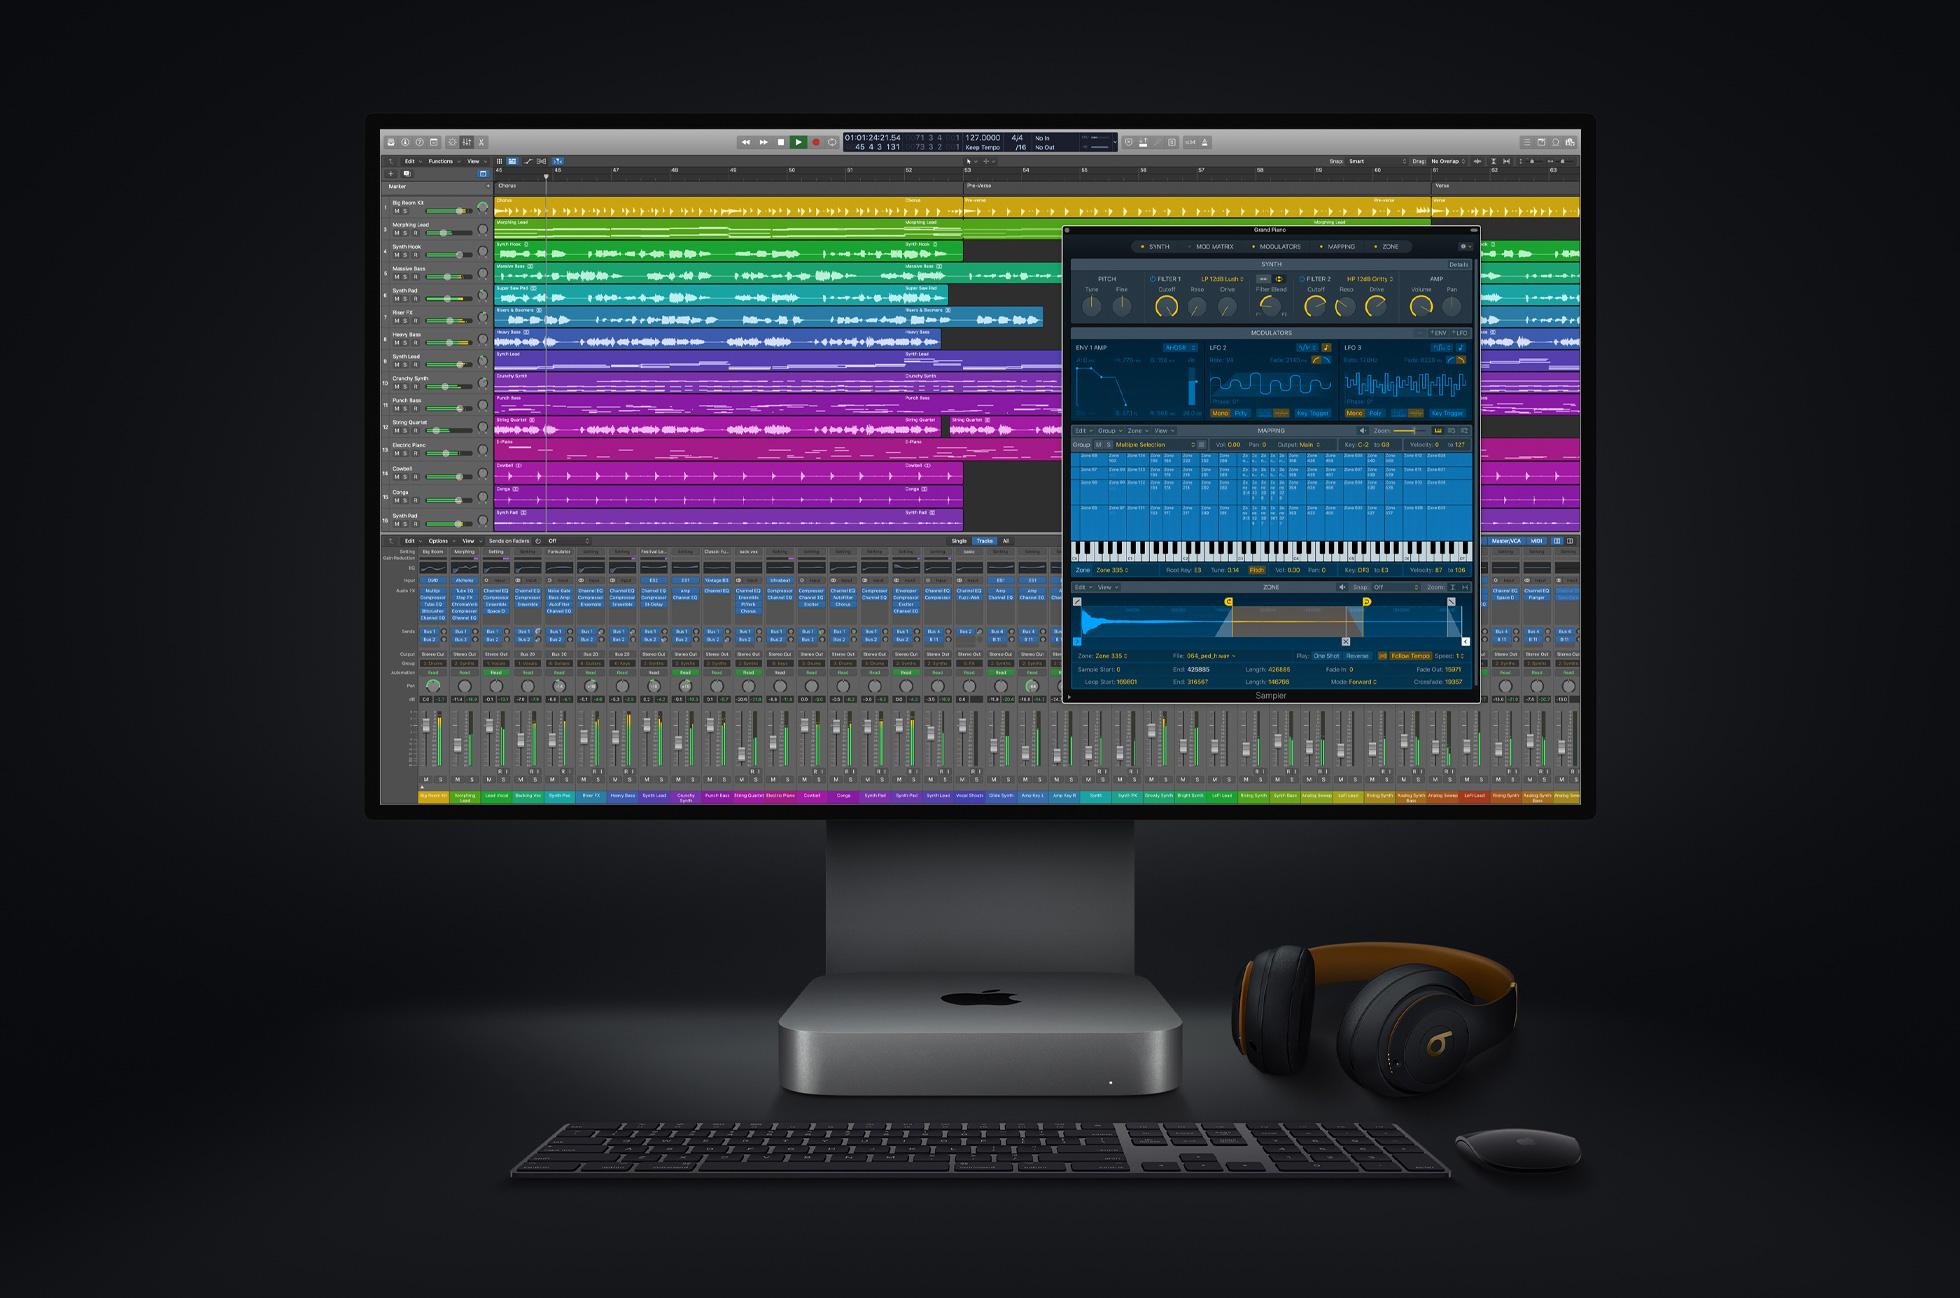 new mac mini logicpro screen